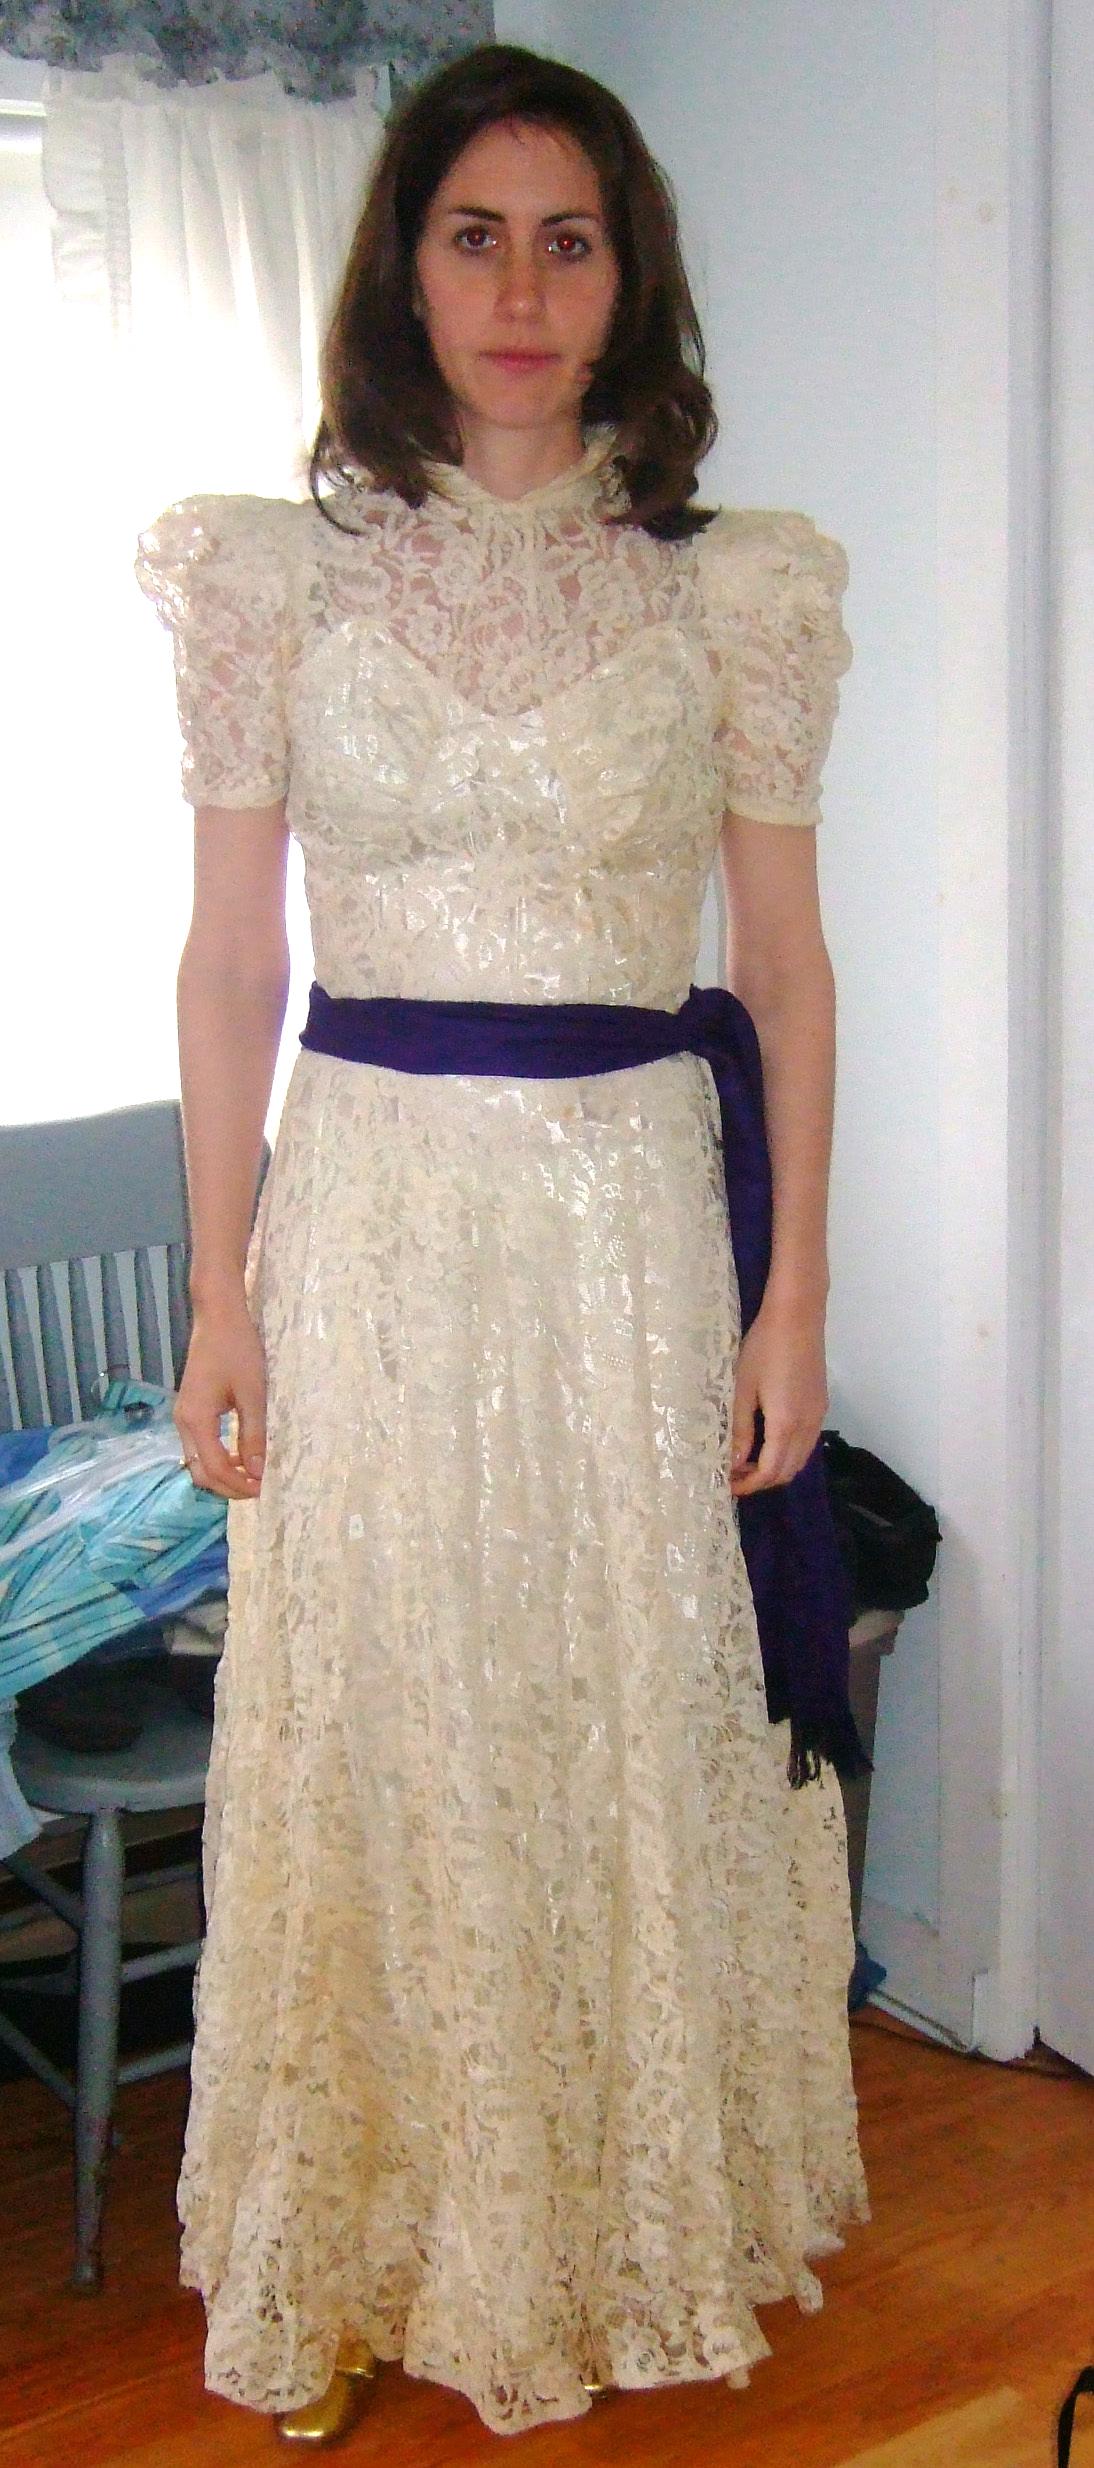 Fullsize Of Grandmother Of The Bride Dresses